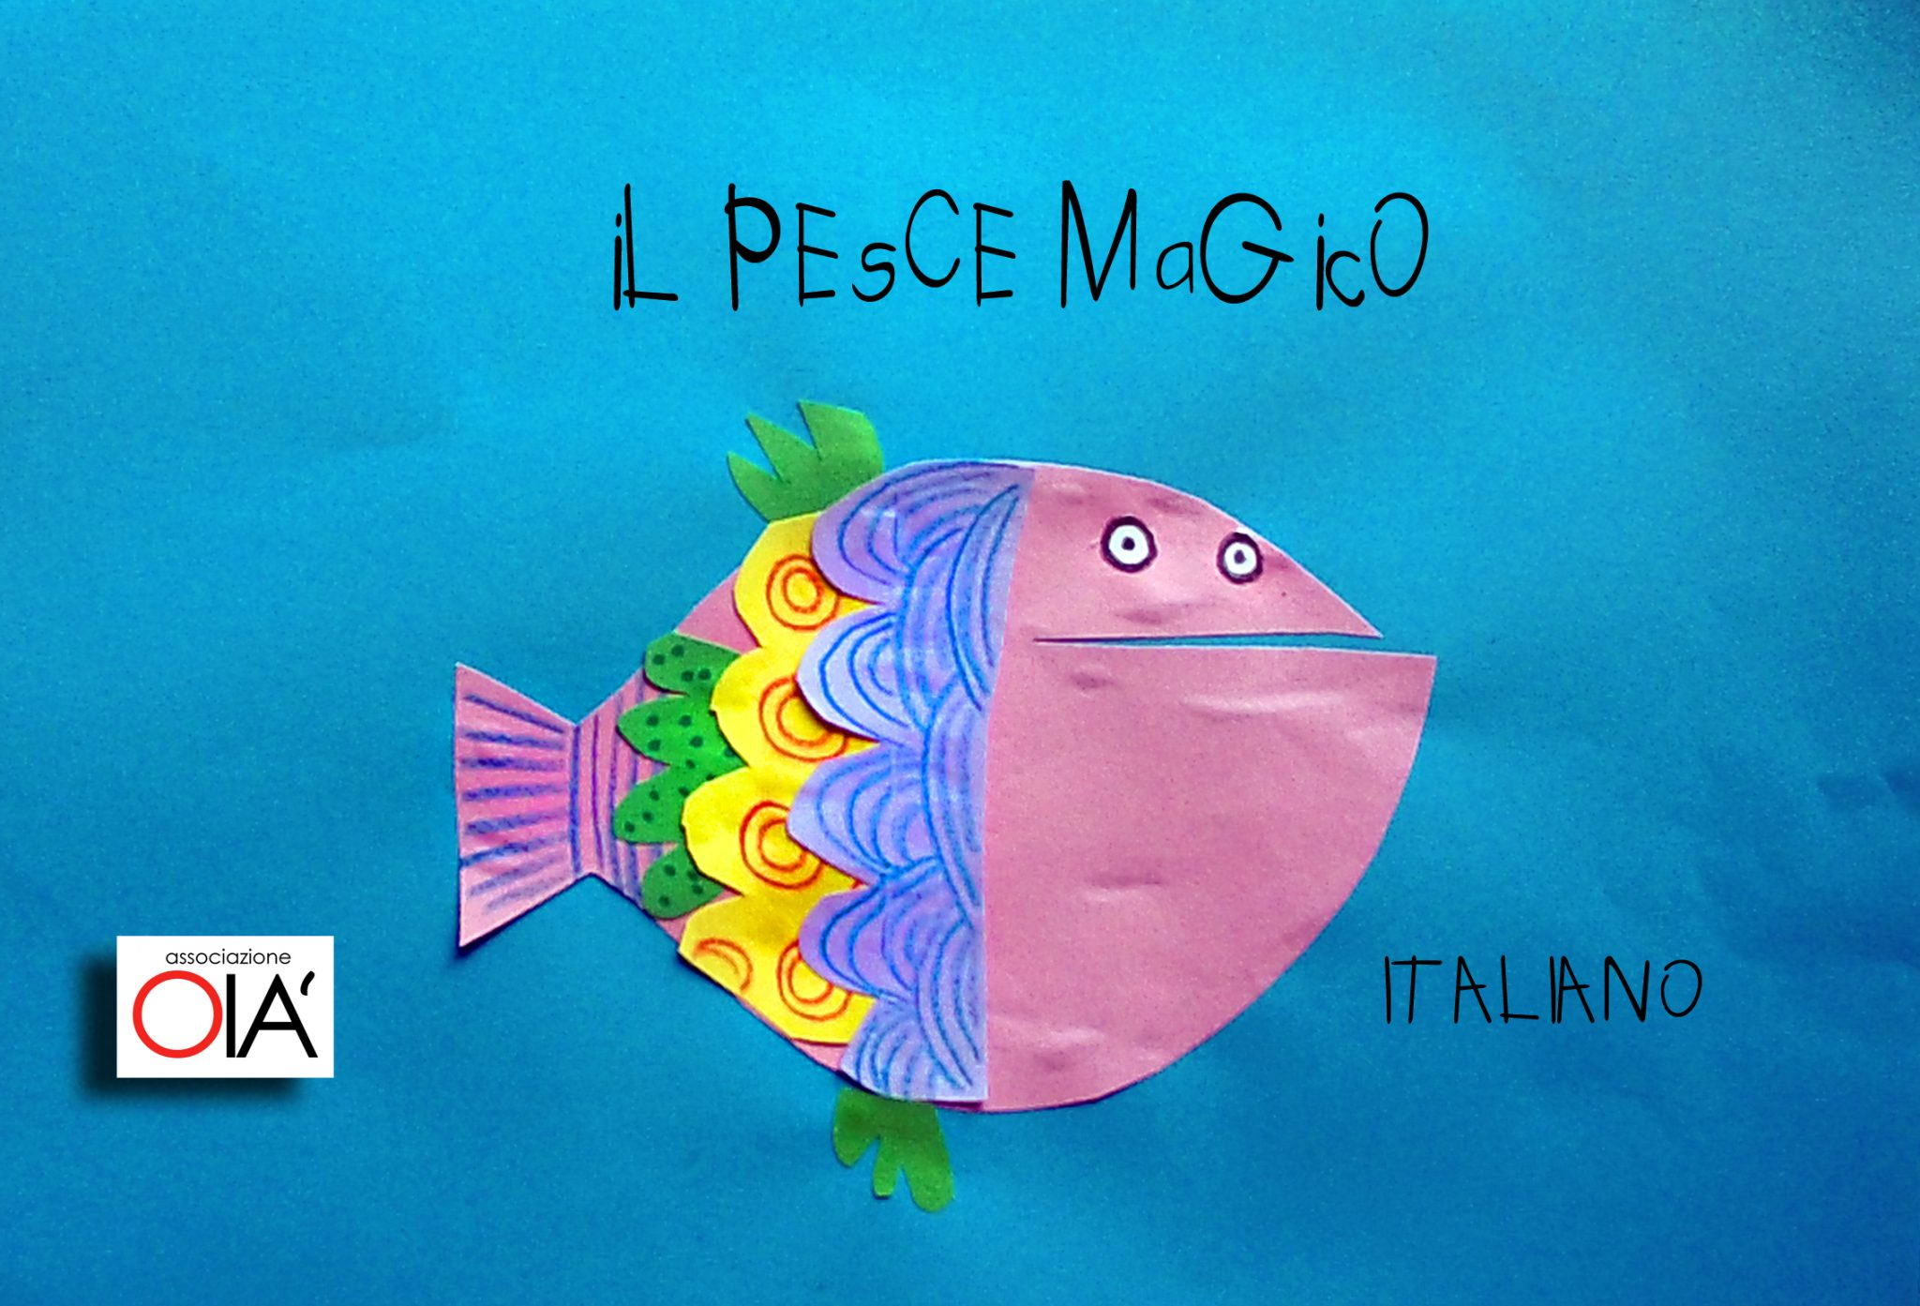 Il pesce magico – Ziriguibum